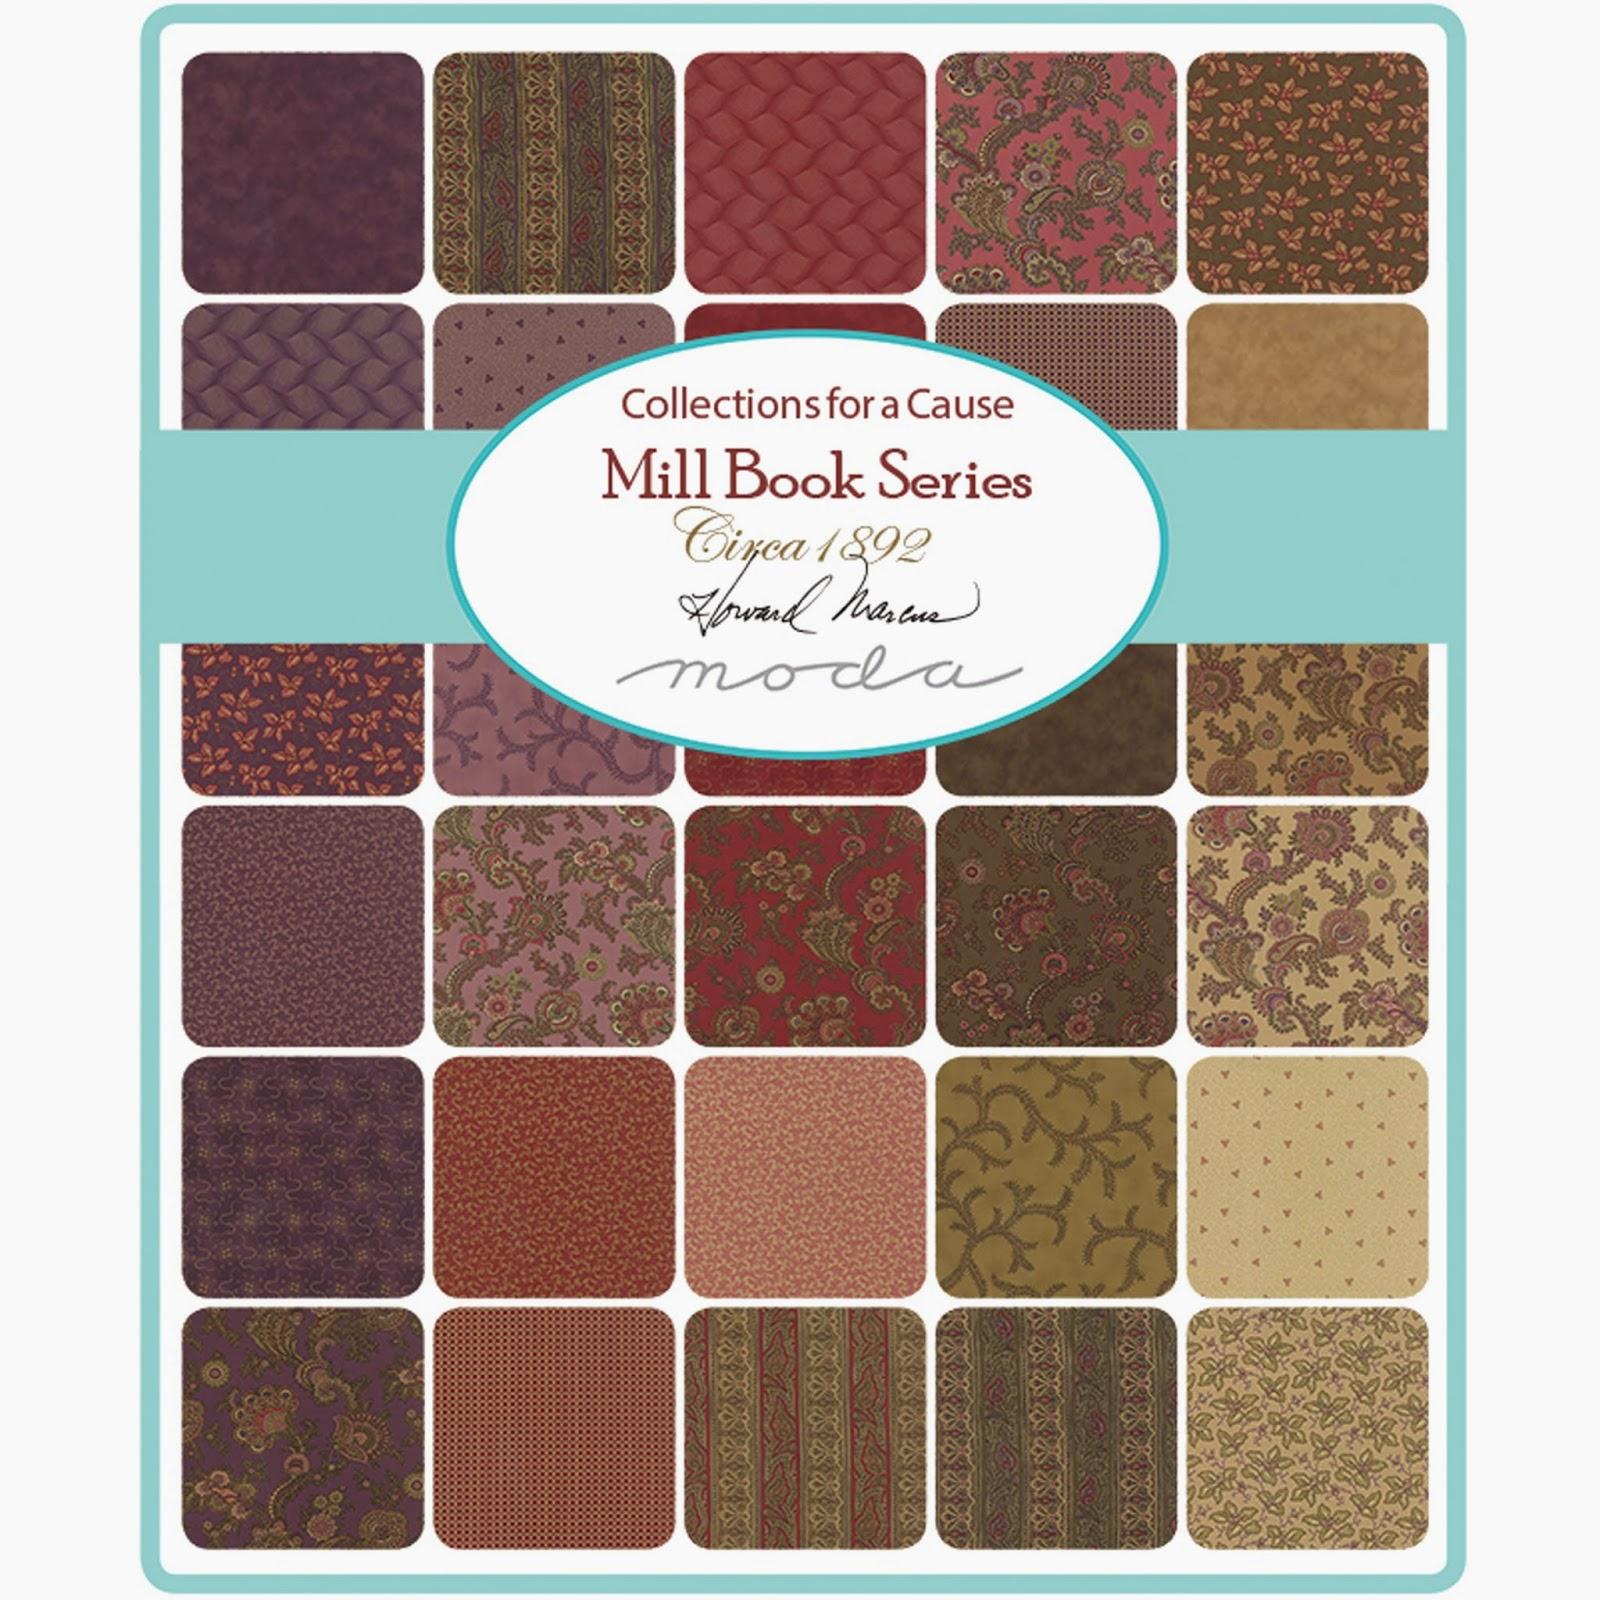 Moda MILL BOOK SERIES CIRCA 1892 Fabric by Howard Marcus for Moda Fabrics